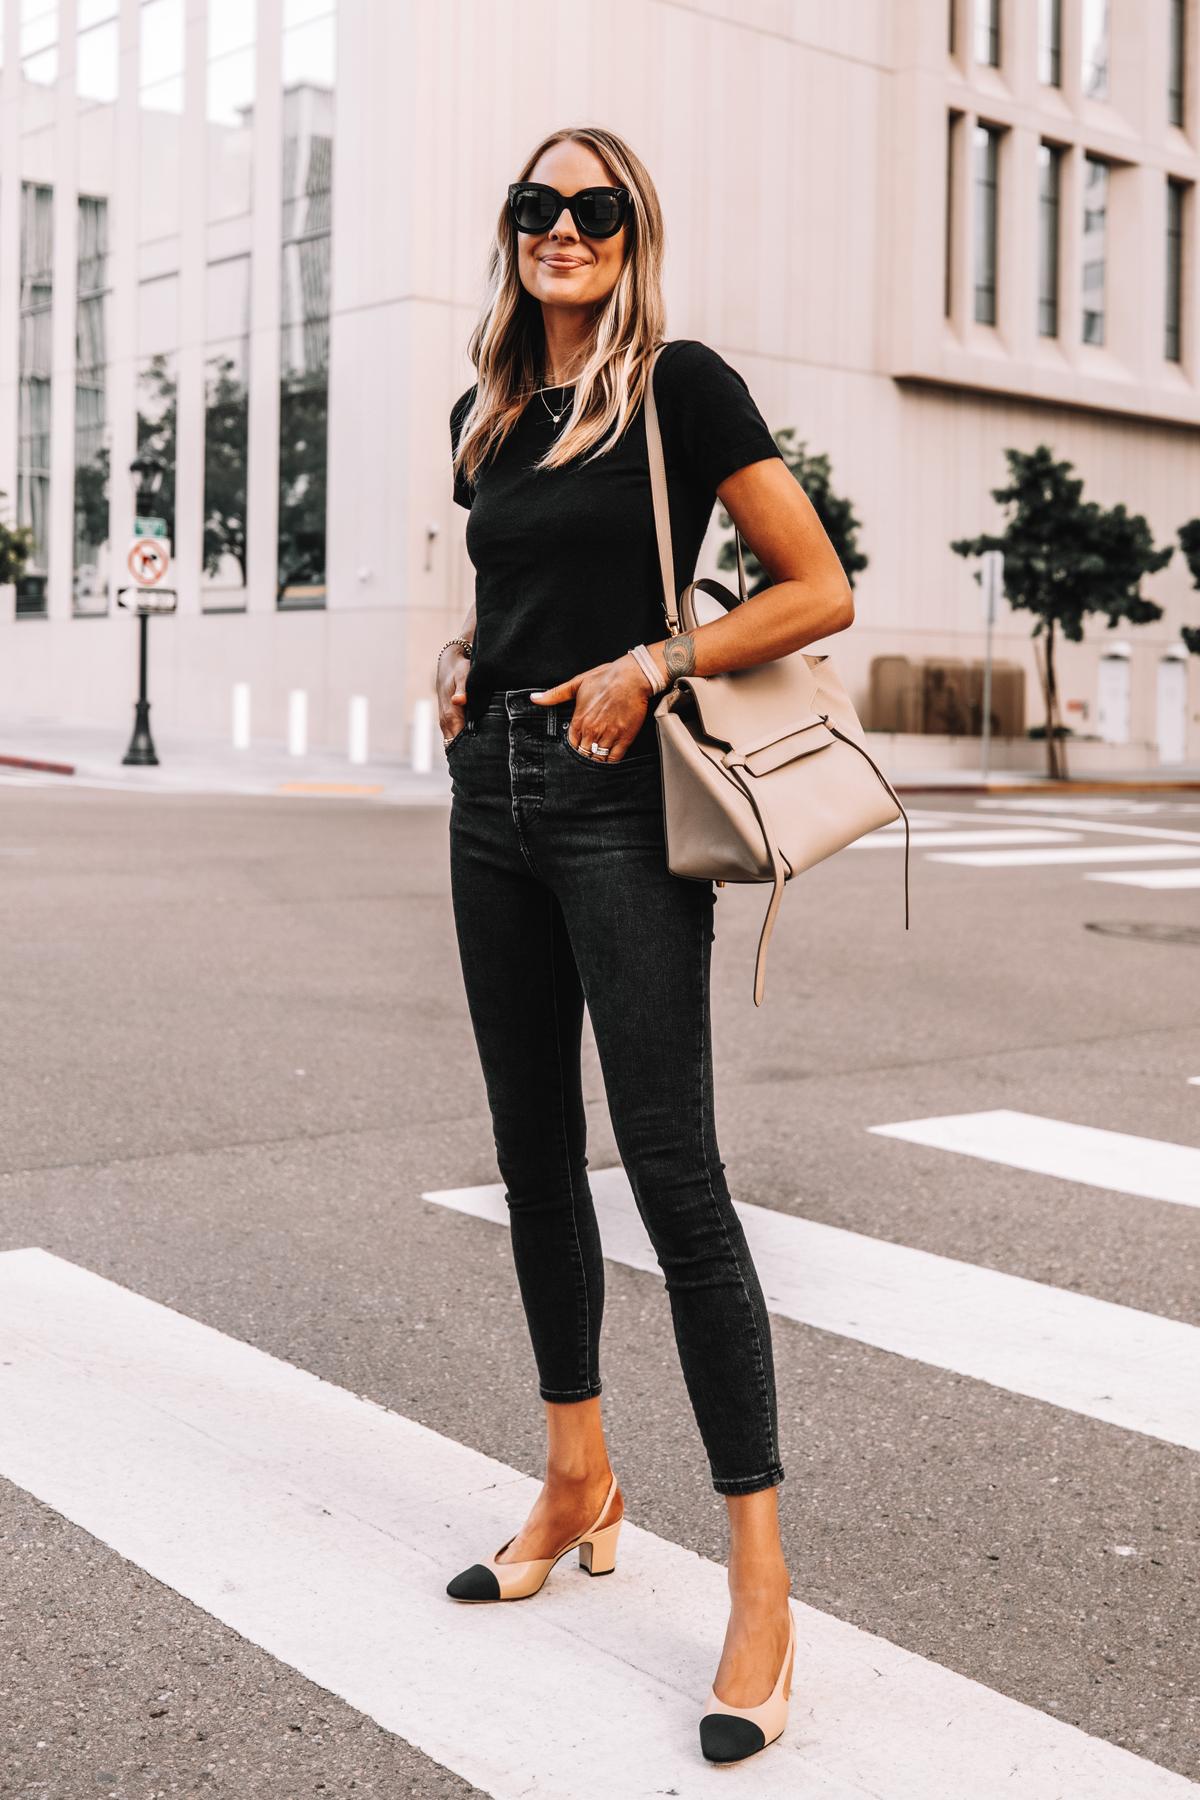 Fashion Jackson Wearing Everlane Black Short Sleeve Sweater Everlane Black Skinny Jeans Chanel Slingbacks Celine Belt Bag